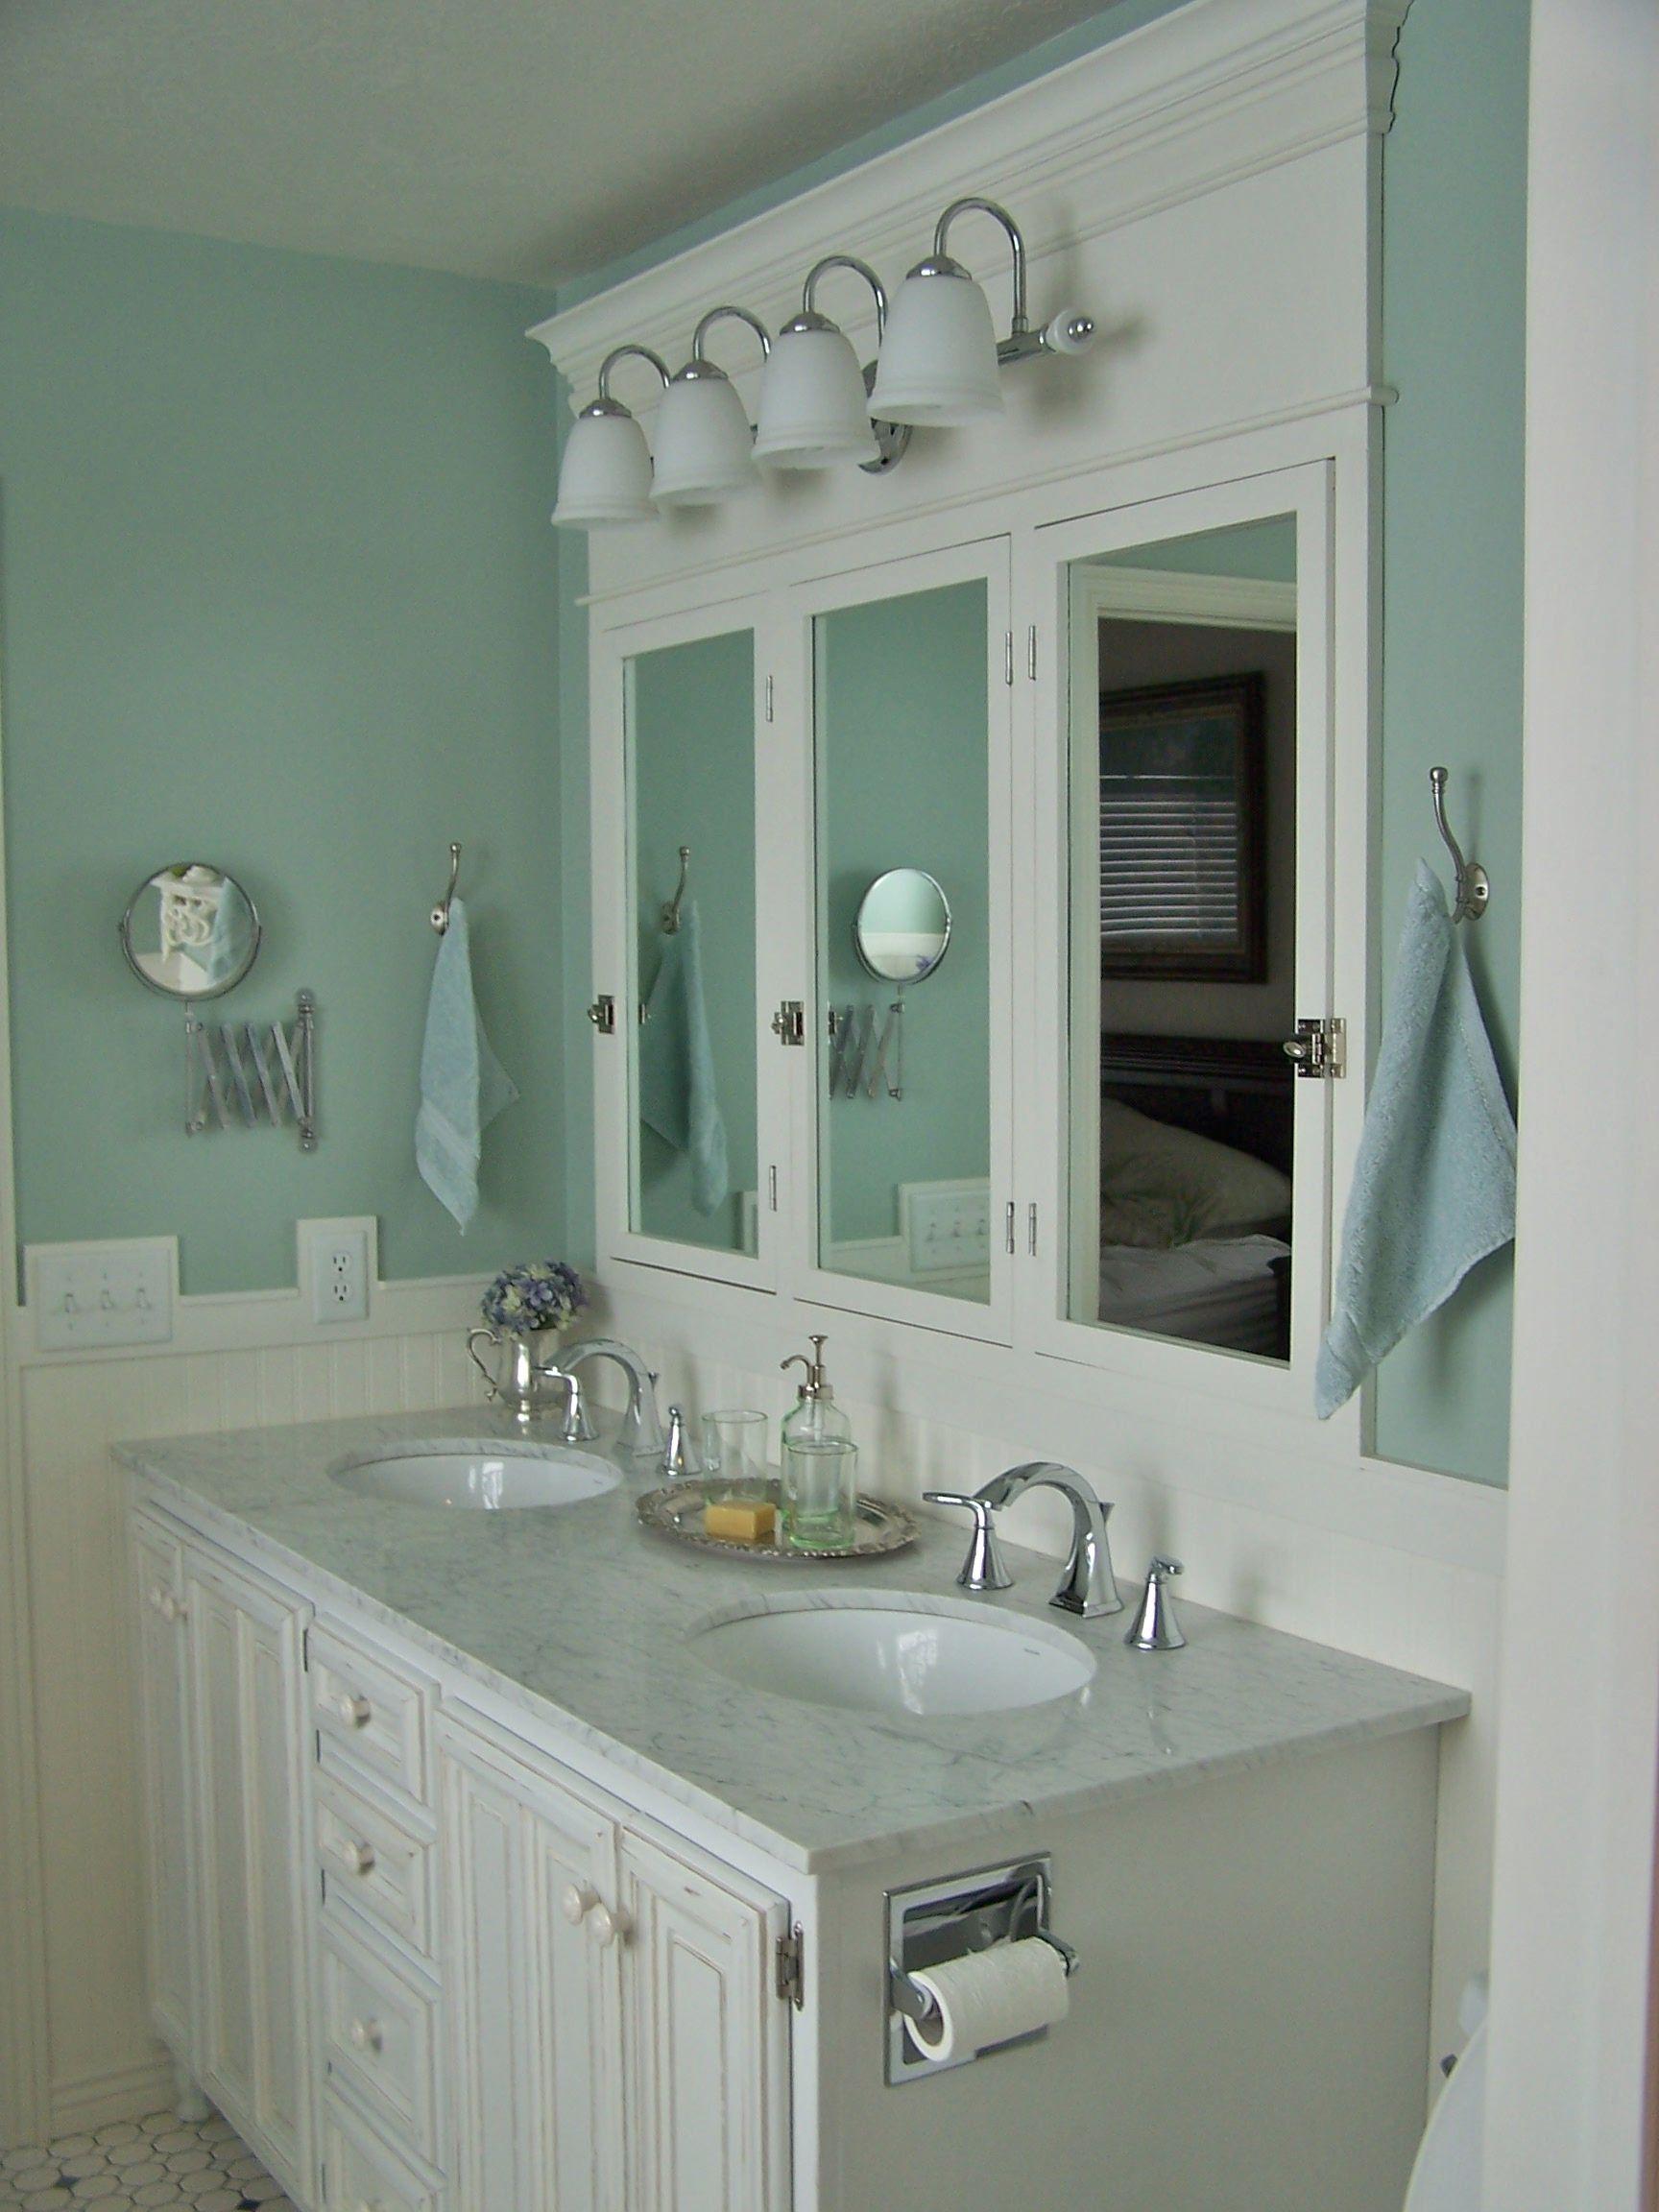 farmhouse bathroom design - light aqua blue walls and white marble